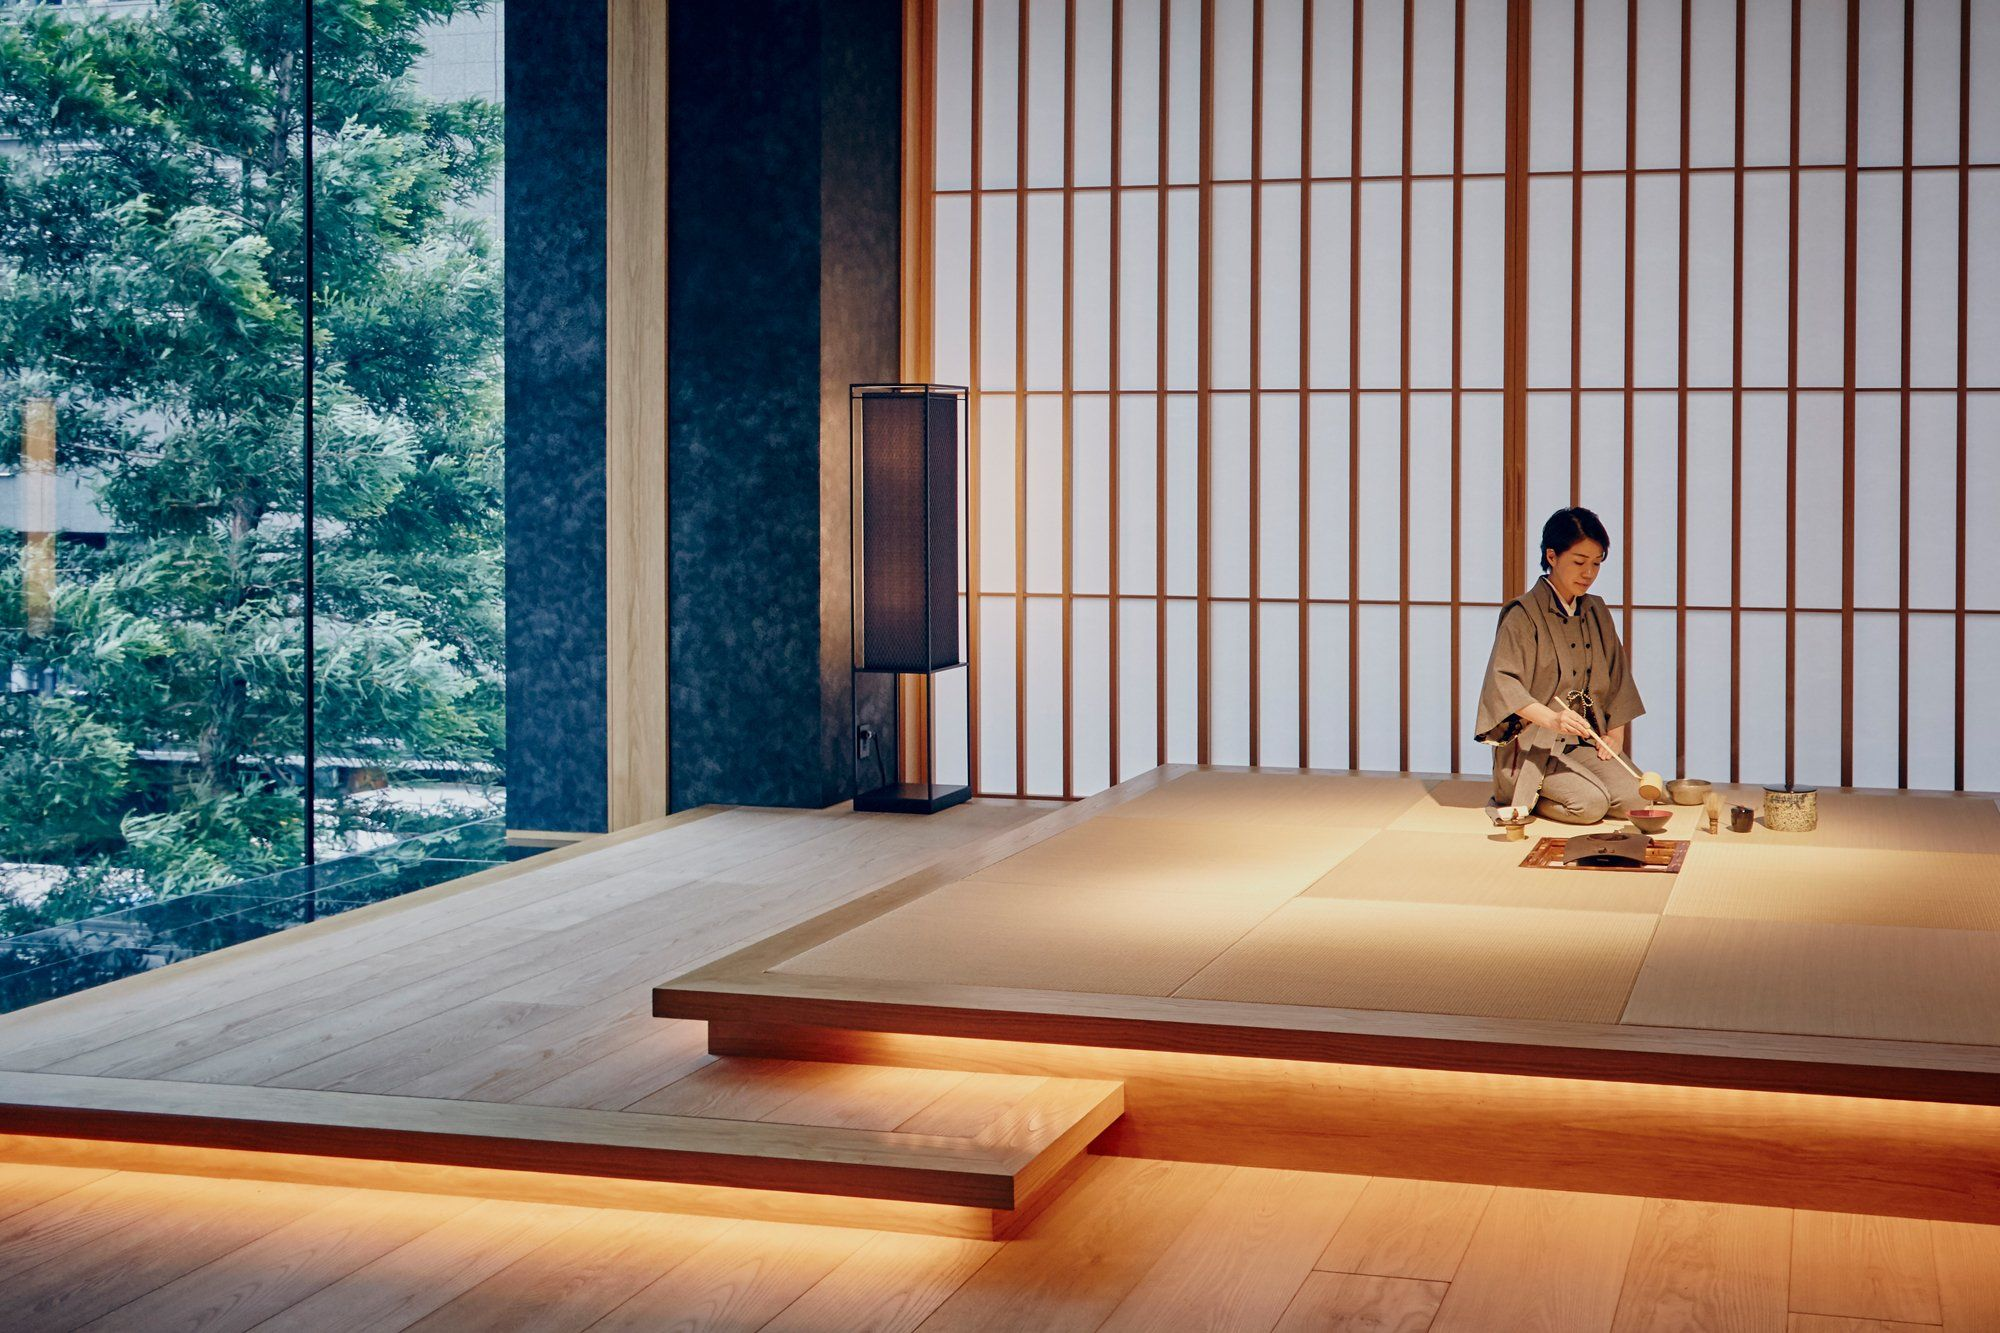 Hoshinoya Tokyo Updated 2018 Hotel Reviews Price Comparison And 308 Photos Japan Tripadvisor Japanese Home Design Japanese Style House Japan Interior